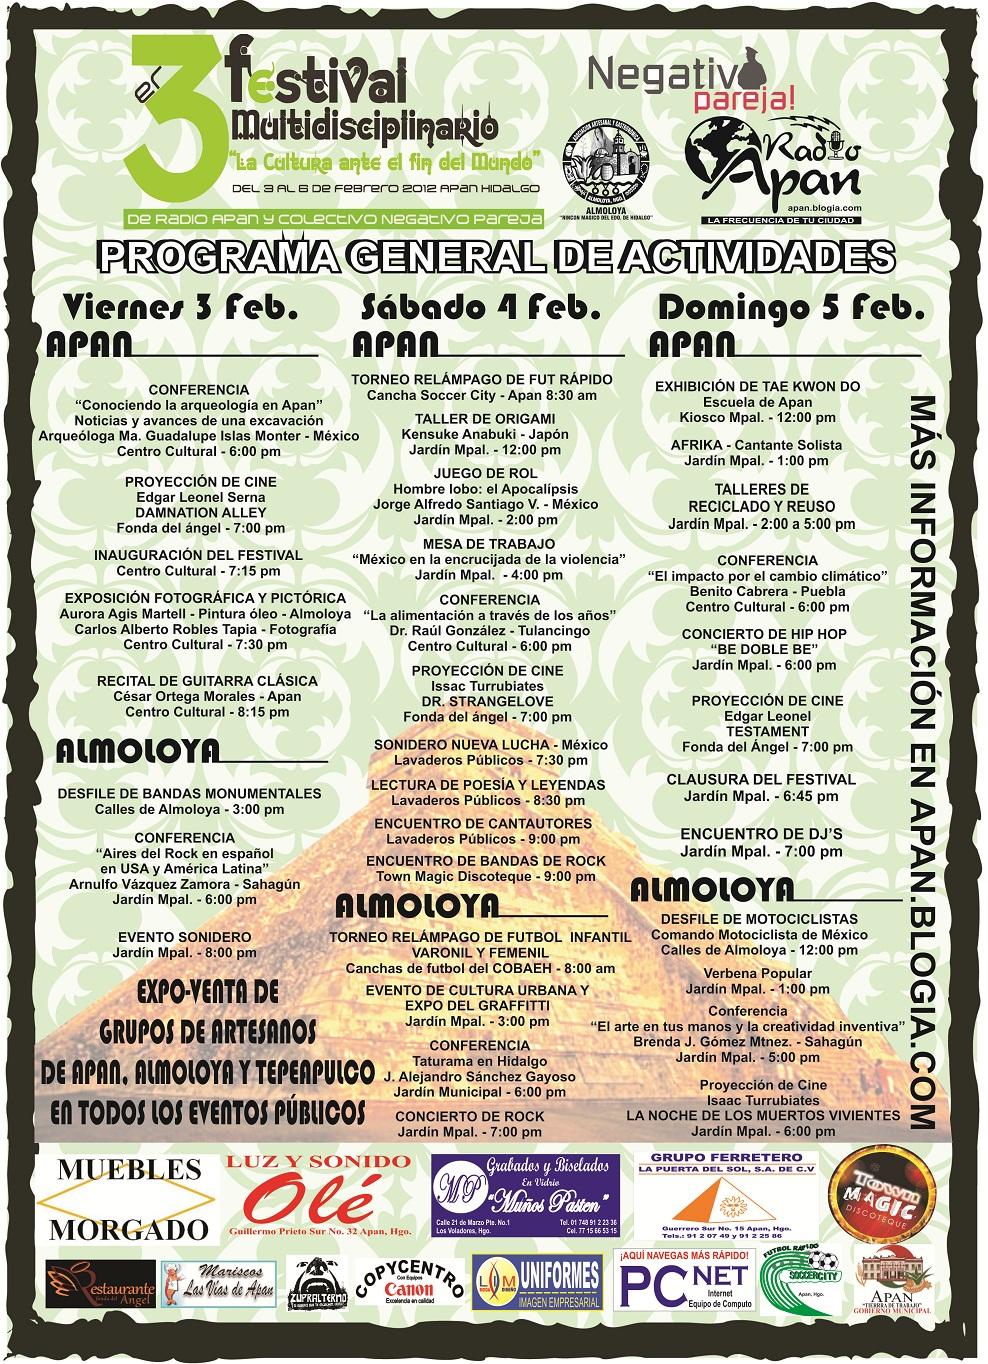 PROGRAMA GENERAL DEL FESTIVAL